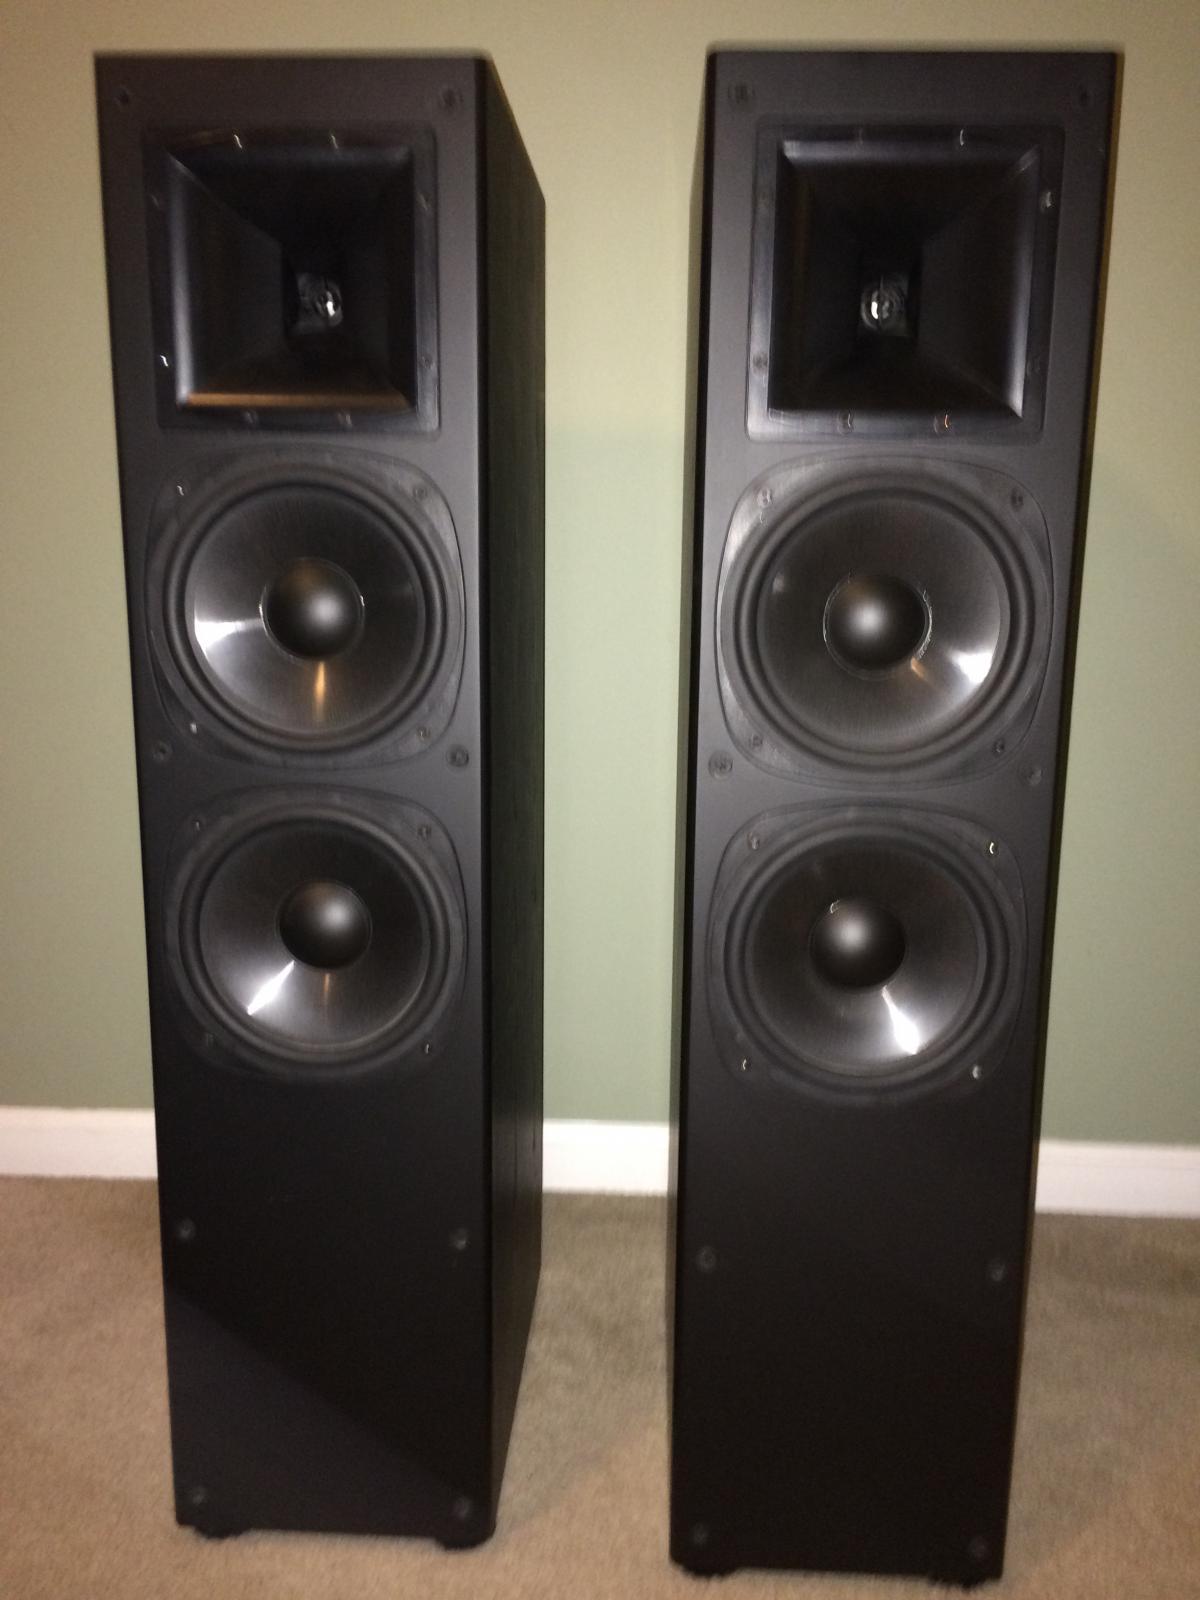 SF3 Floorstanding Speakers  KSW12 Subwoofer For Sale